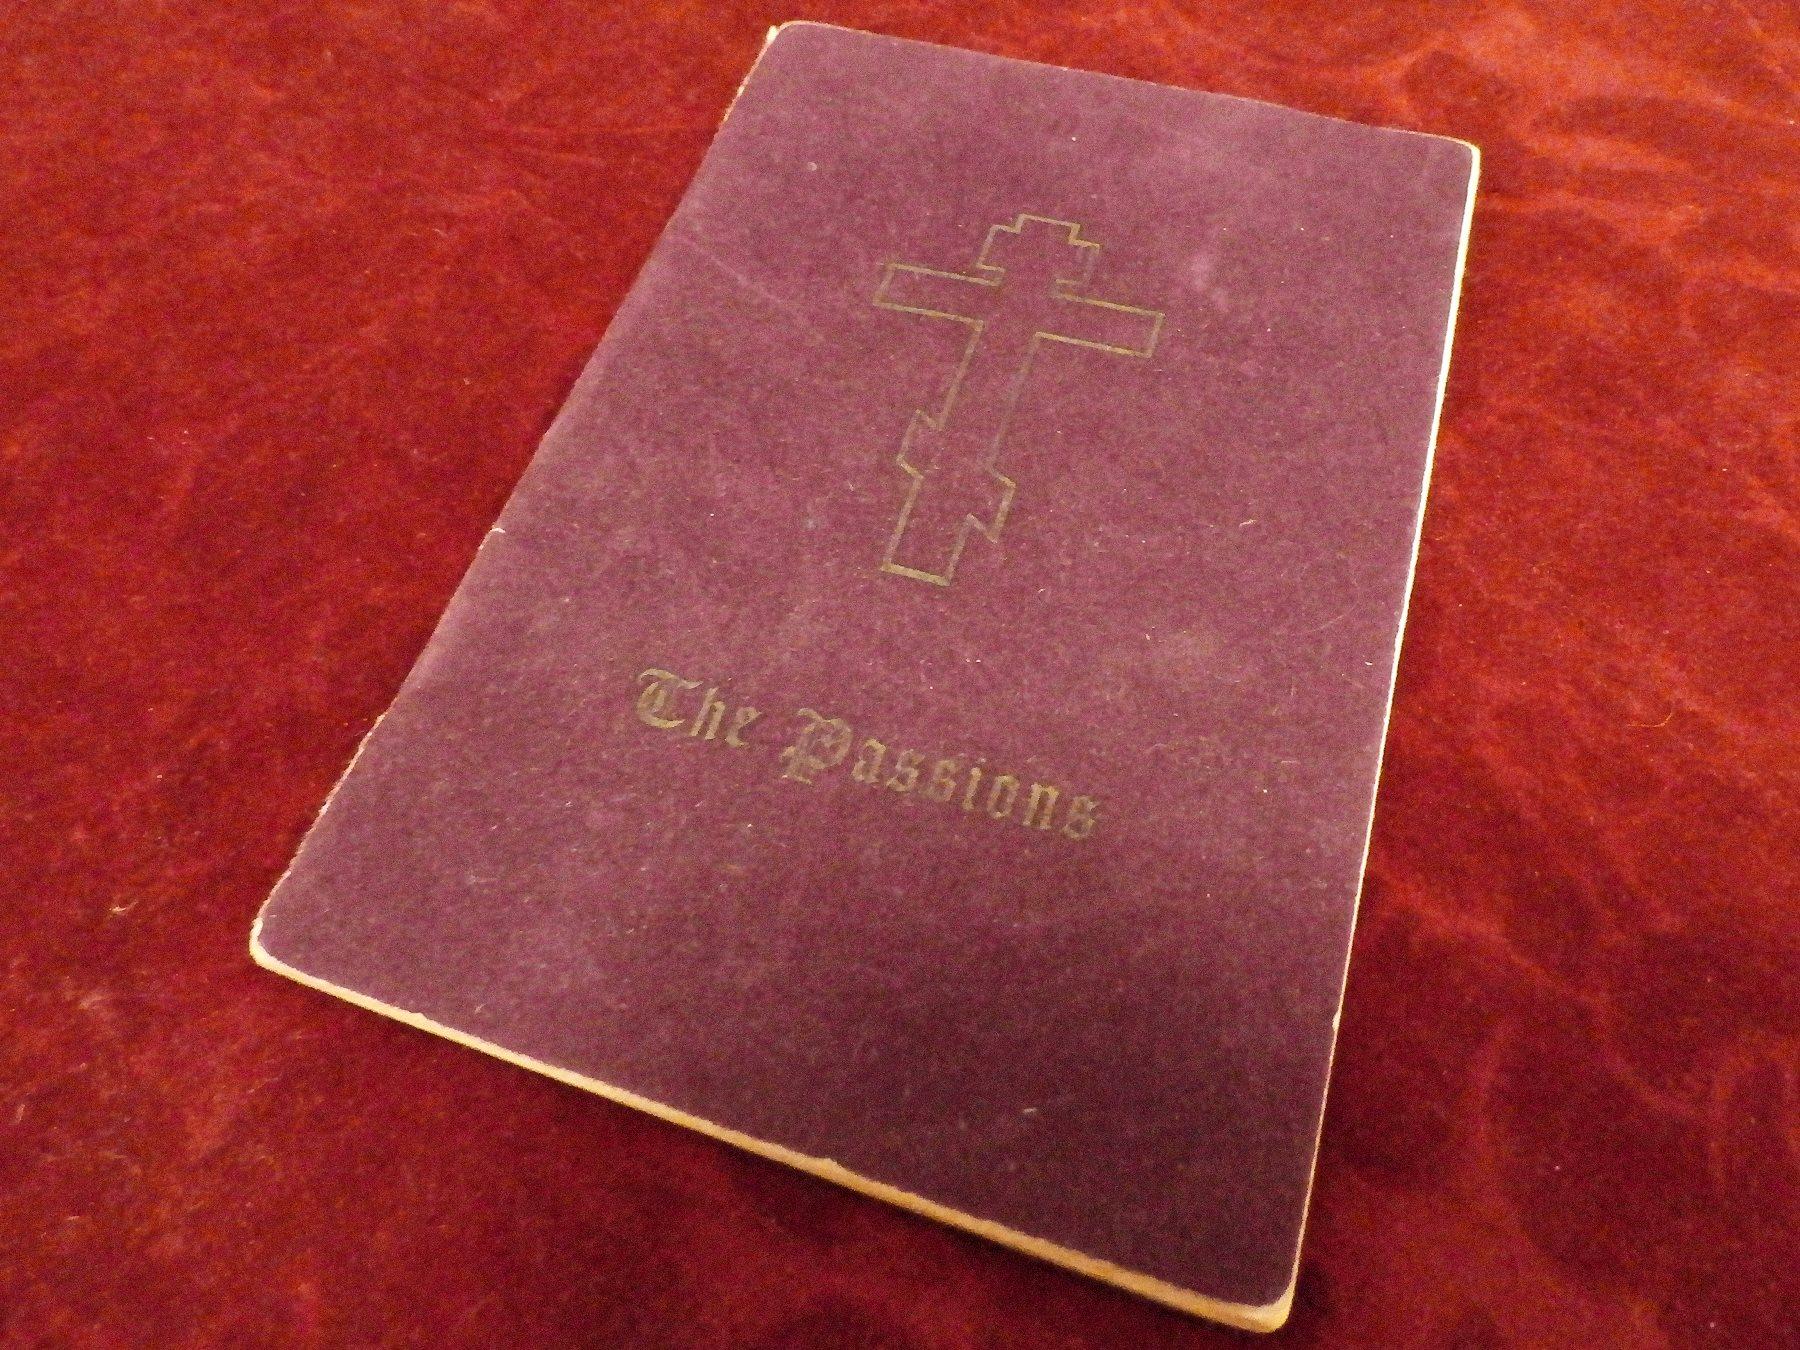 00 Sasha Ressetar. Baba's Passion Book. 09.04.15